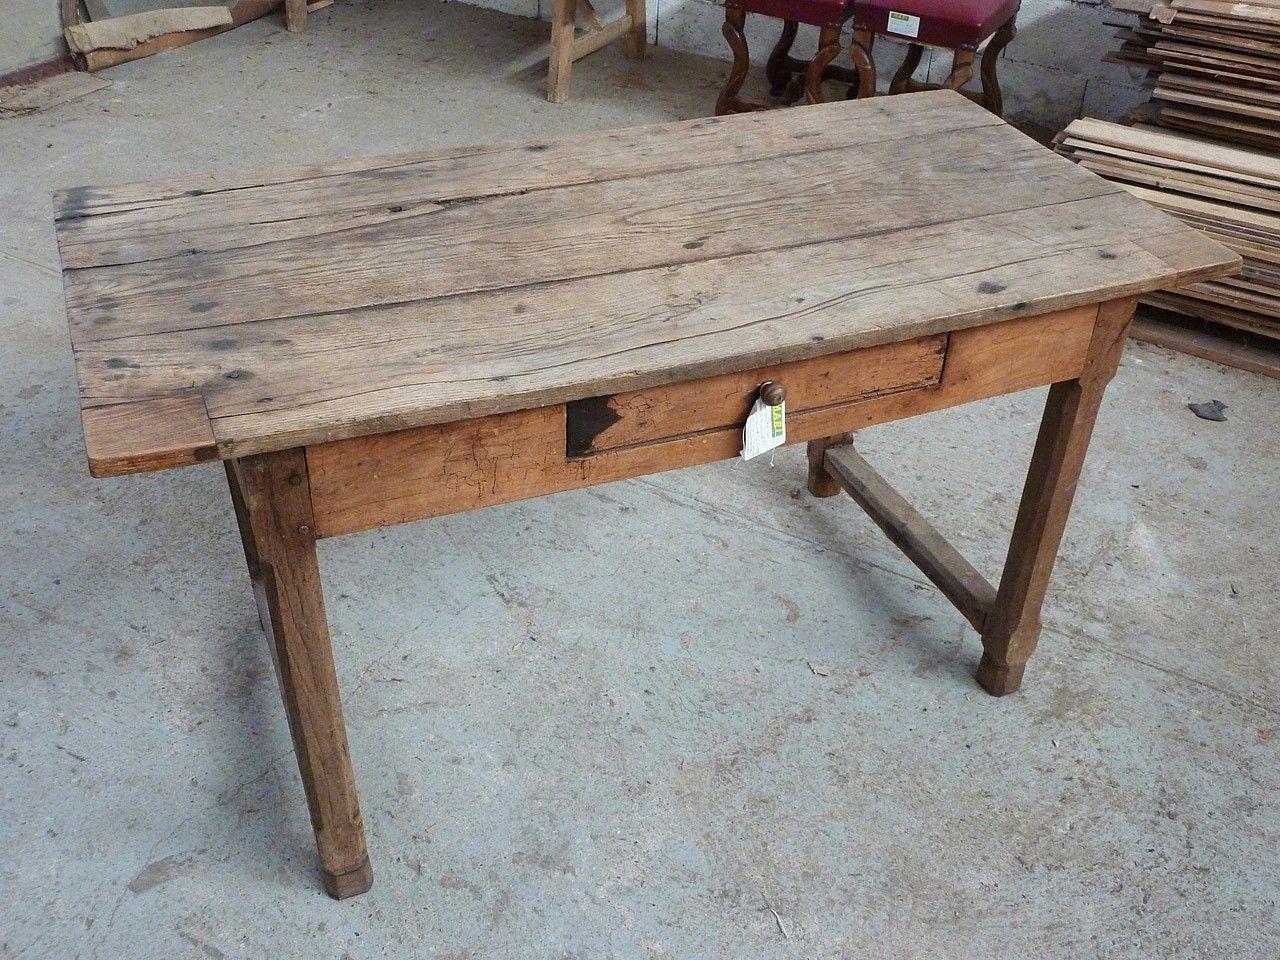 French Antique Small Farm Table Antique Farm Table Table Farm